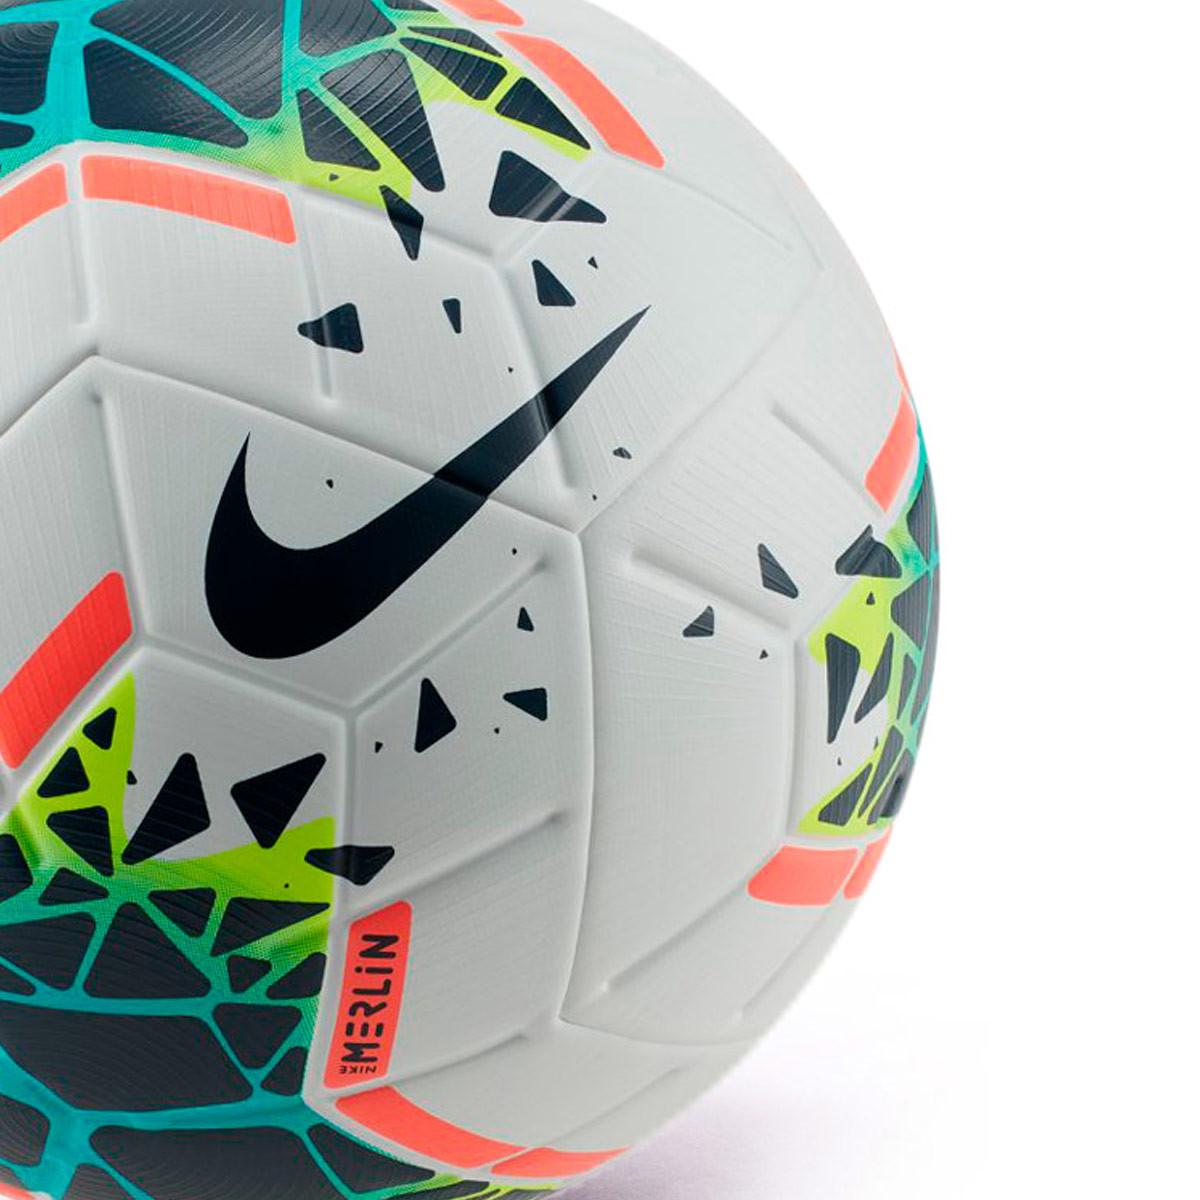 adjetivo encuesta pastel  Ball Nike Merlin 2019-2020 White-Obsidian-Blue fury - Football store Fútbol  Emotion